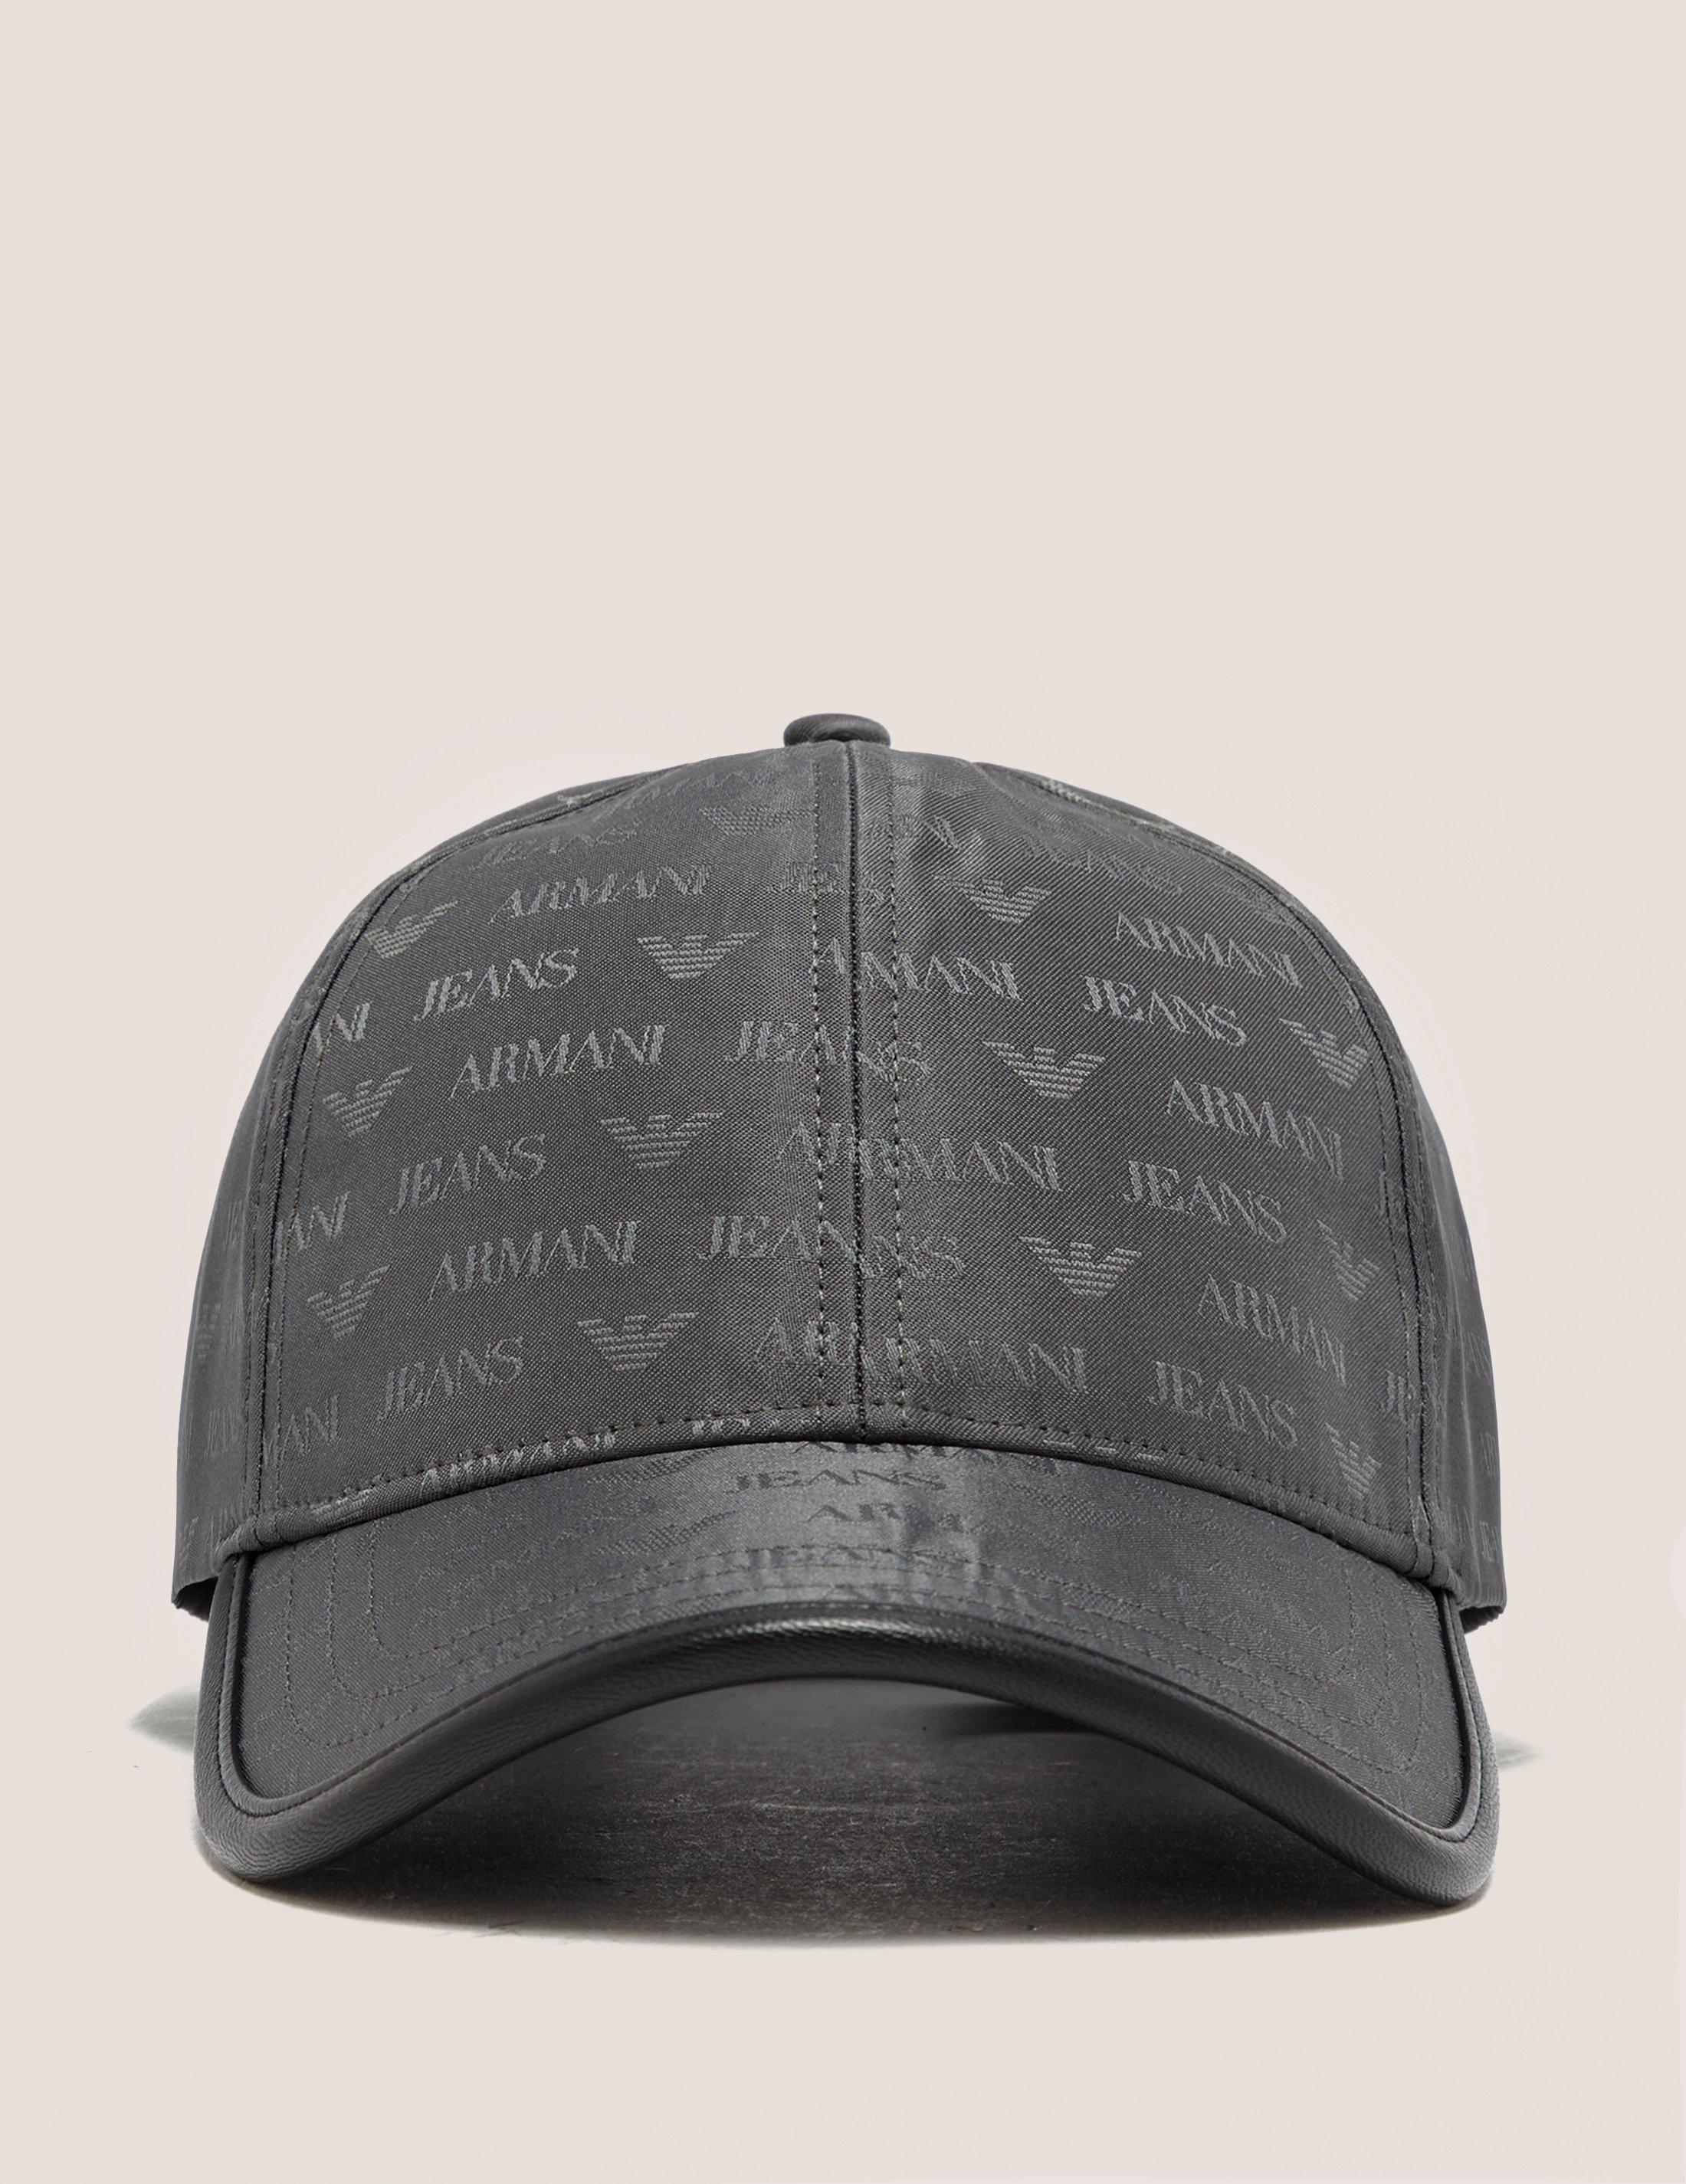 0a9860717e02a Armani Jeans Mens Nylon Print Cap Grey in Gray for Men - Lyst